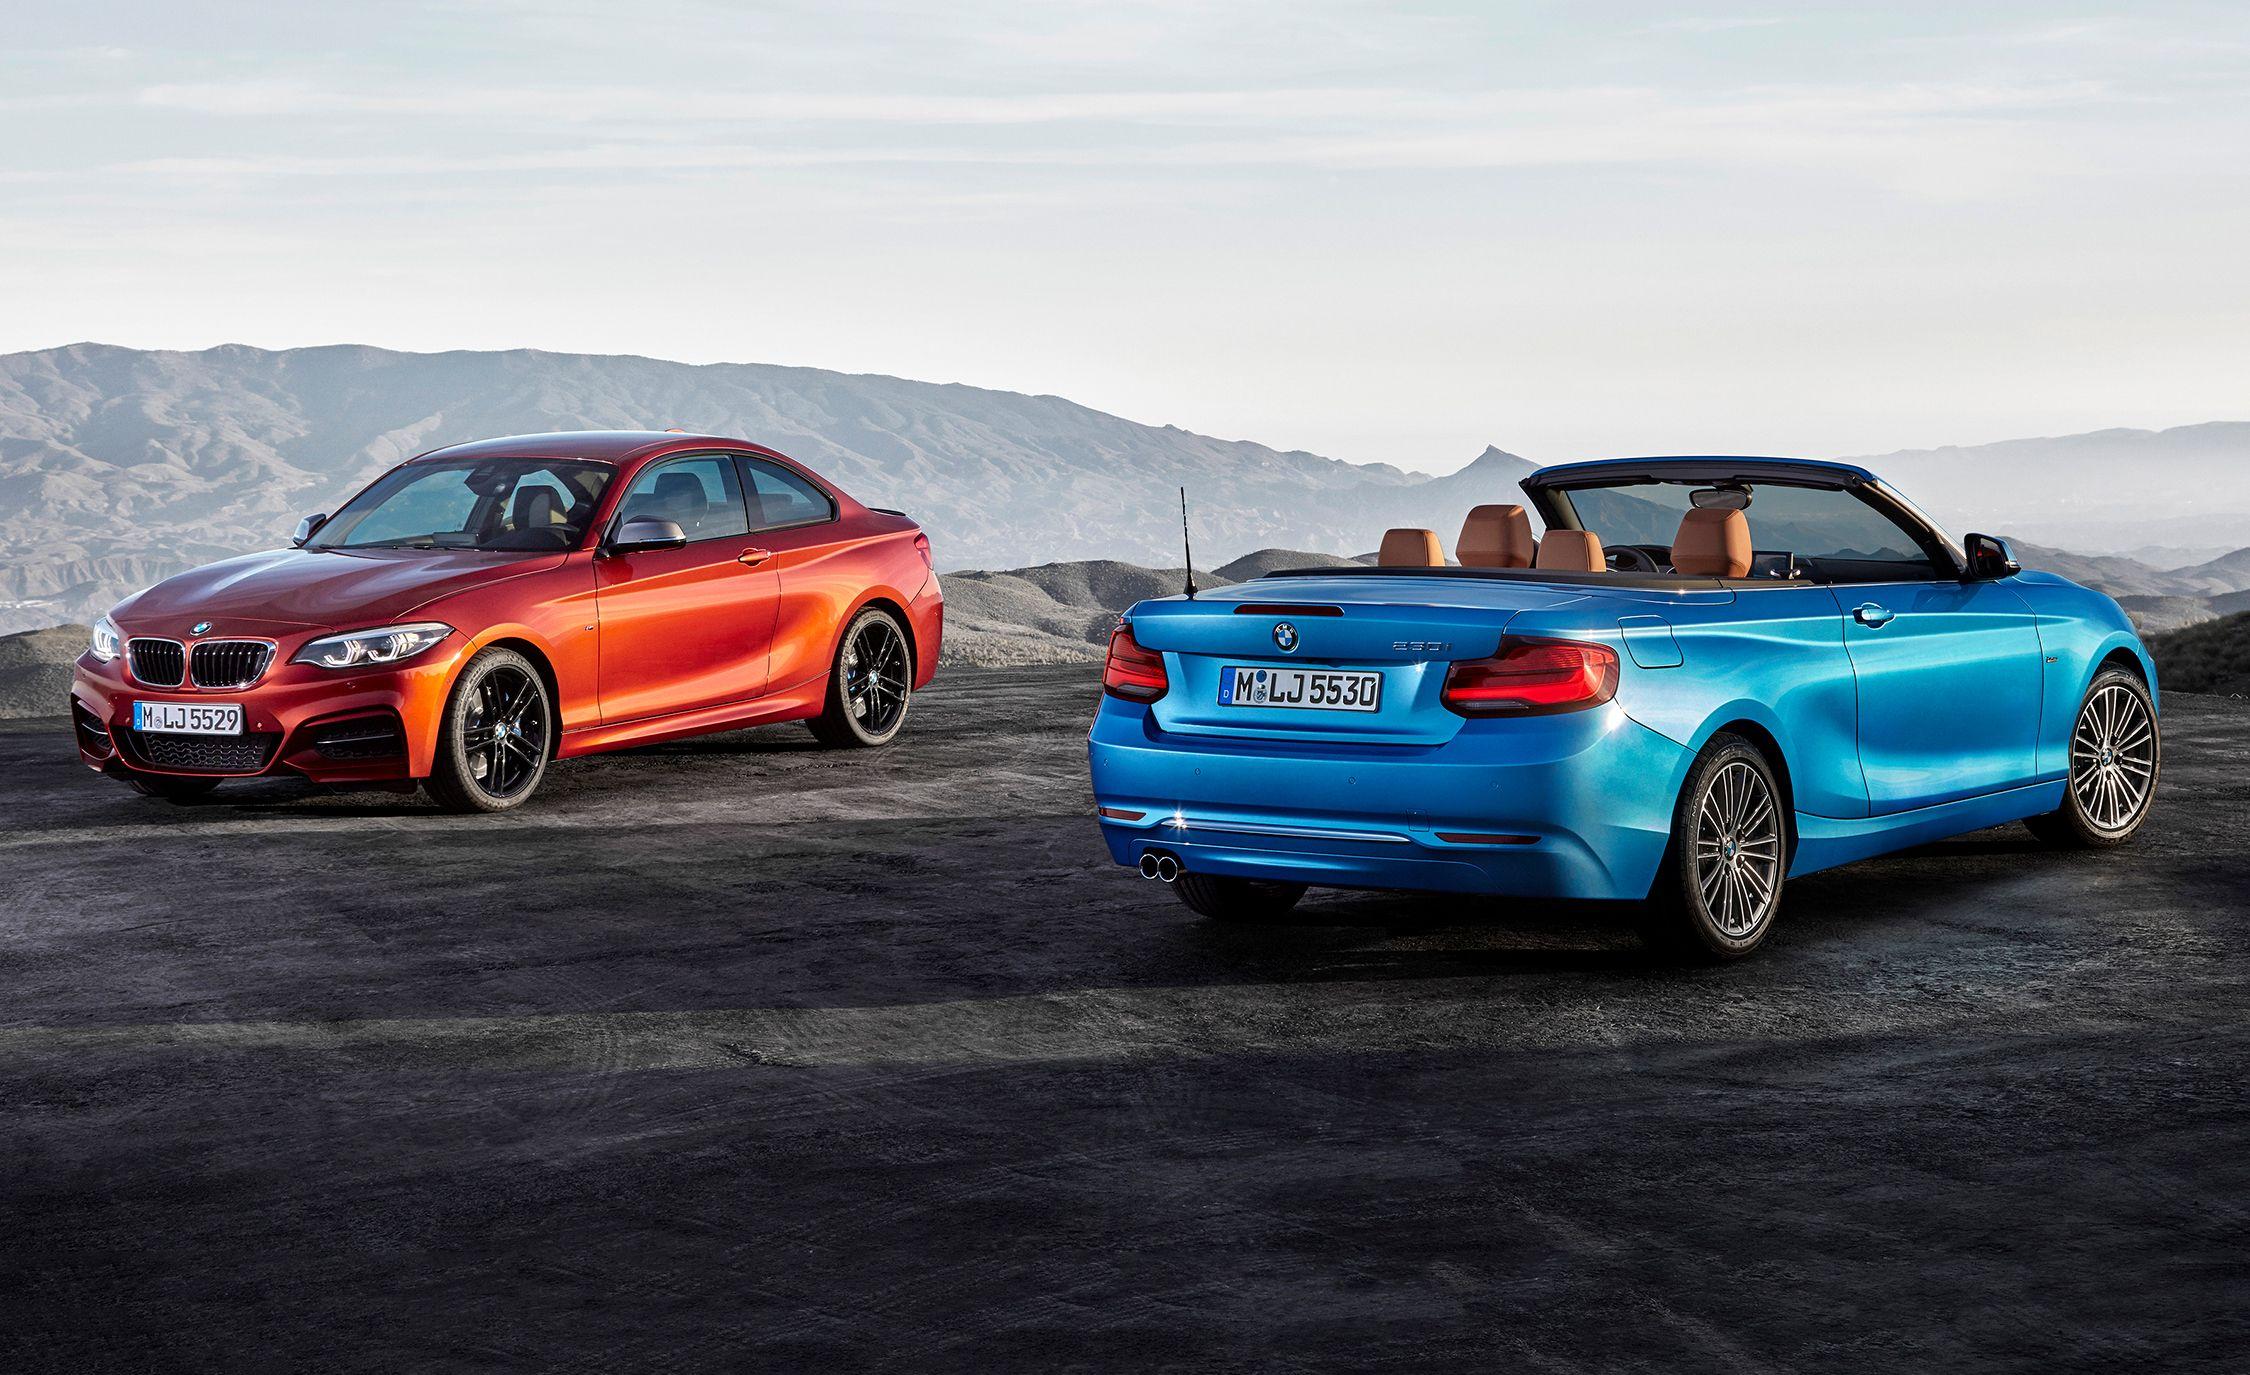 2018 BMW 2-series: Aesthetic Refresh, Manual Saved